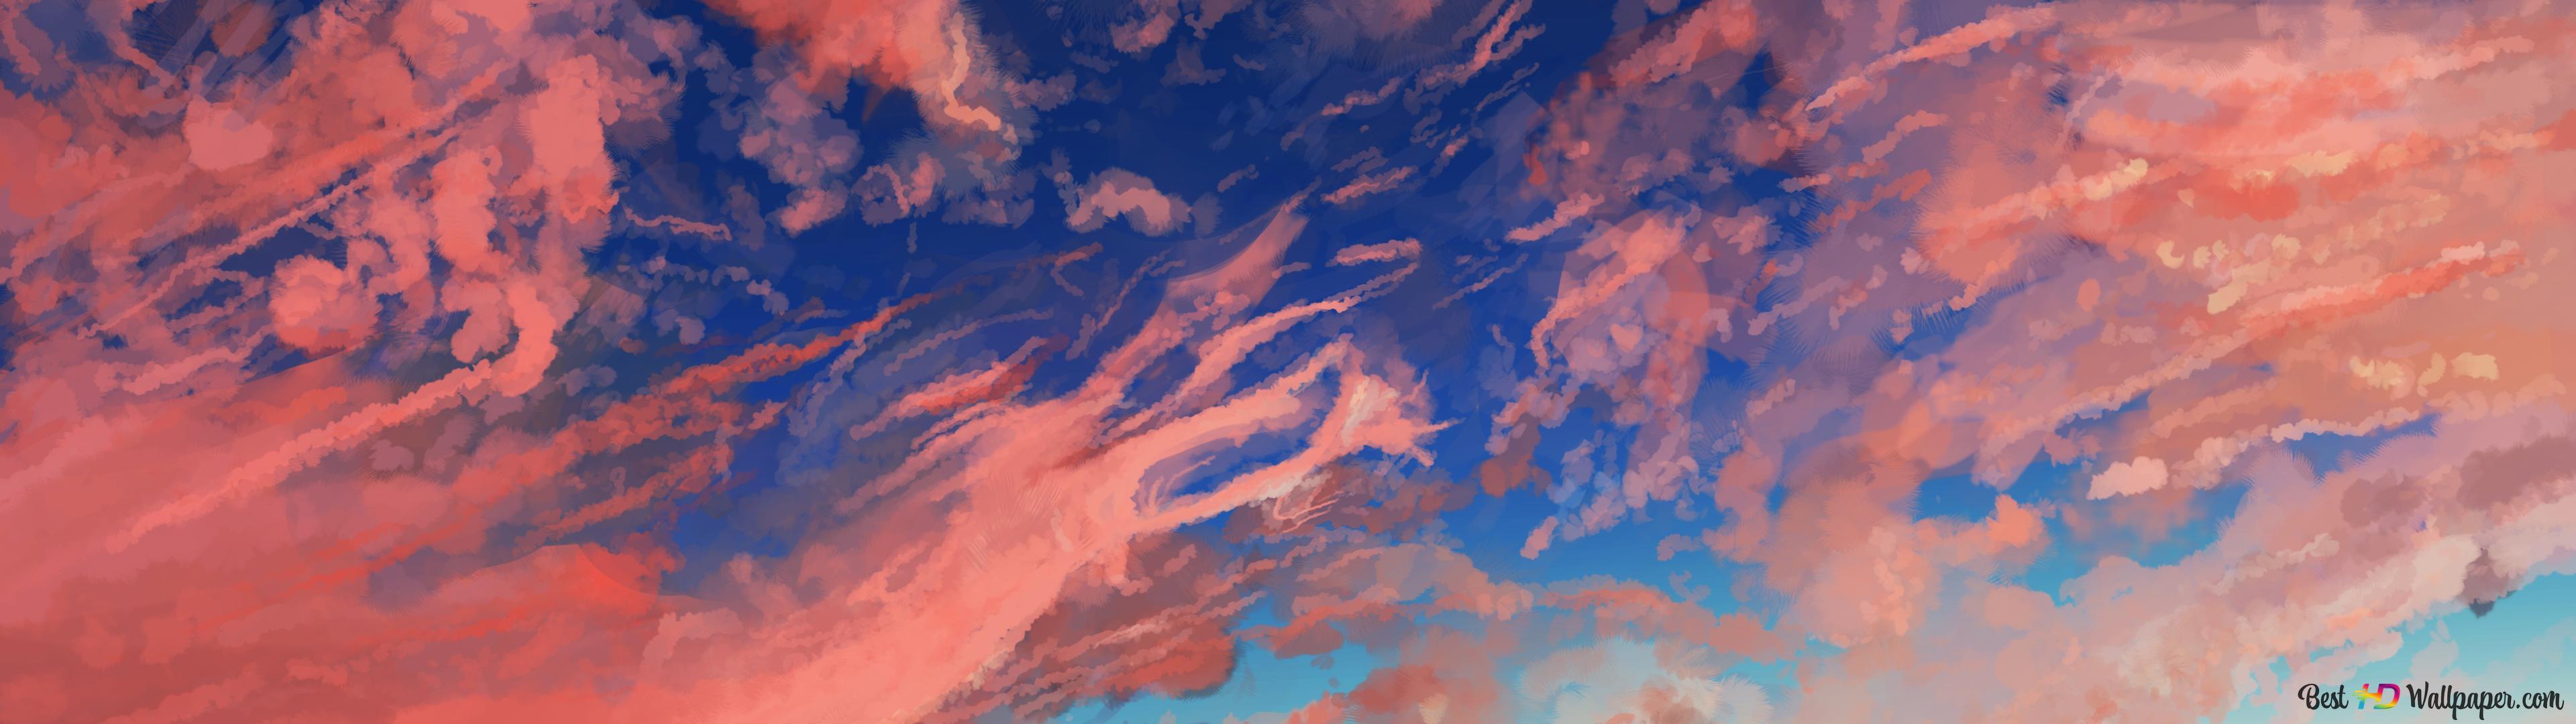 Cloud Sky Anime Unduhan Wallpaper Hd